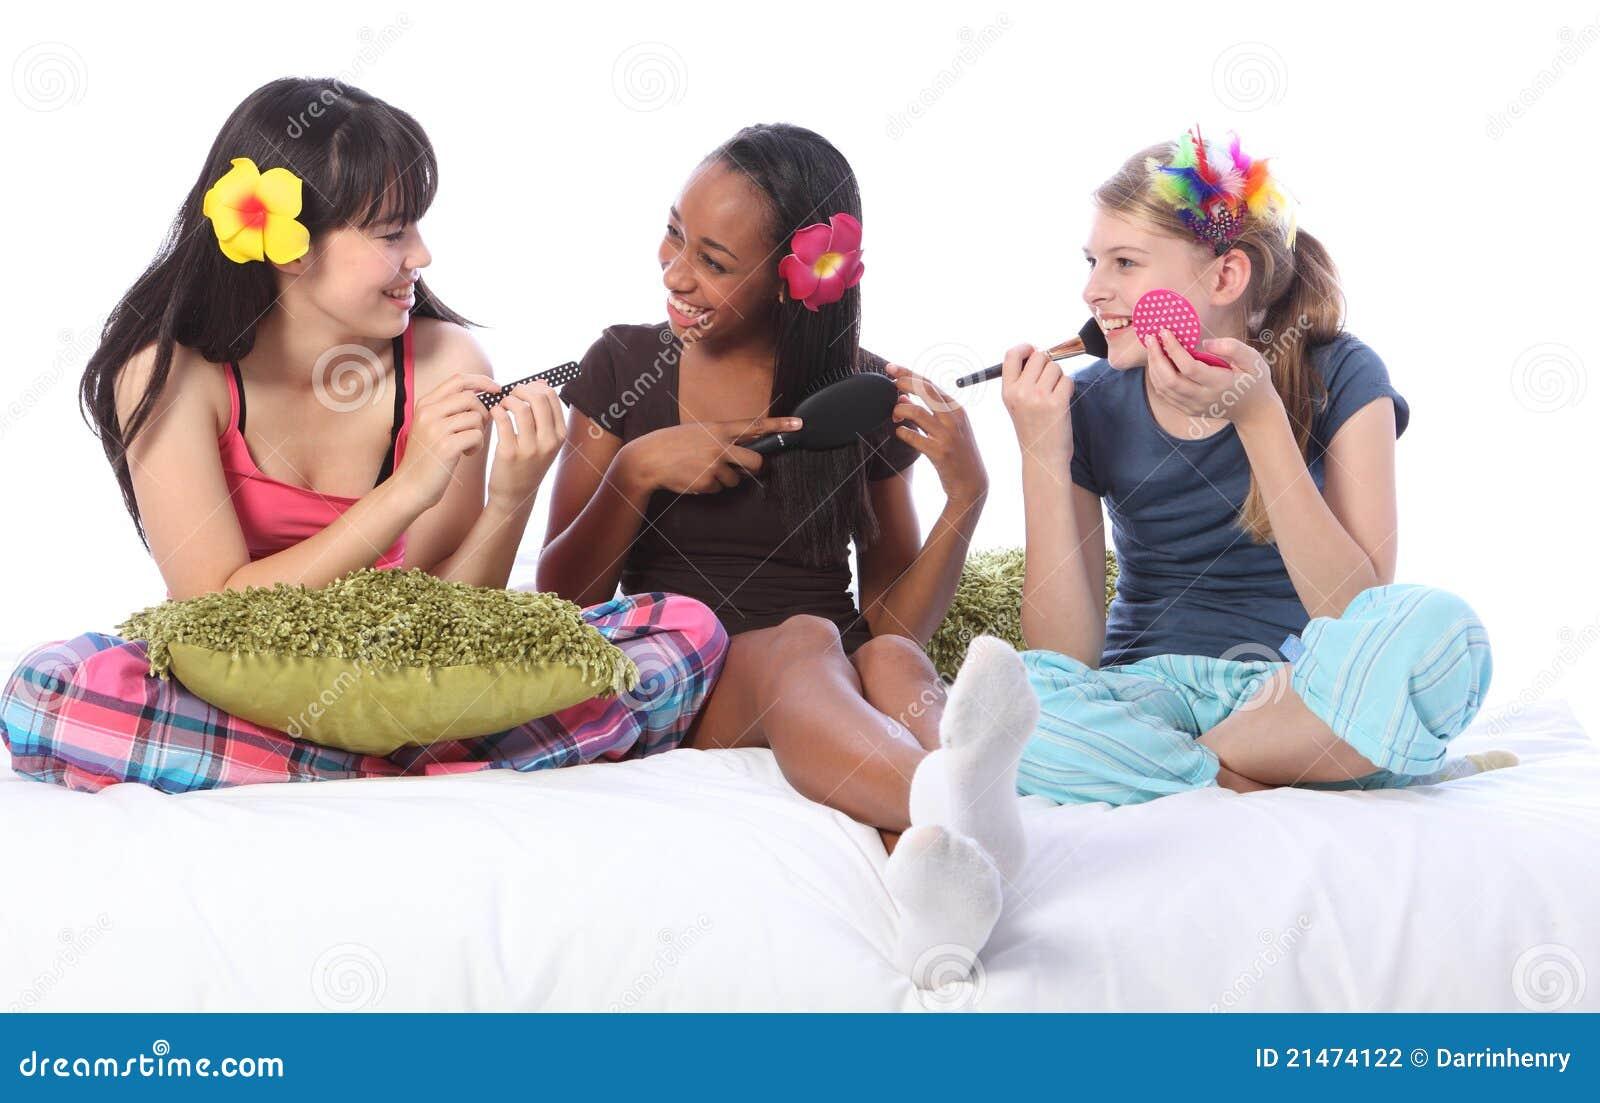 Slumber Party Make Up For Ethnic Teenage Girls Stock Photo ...